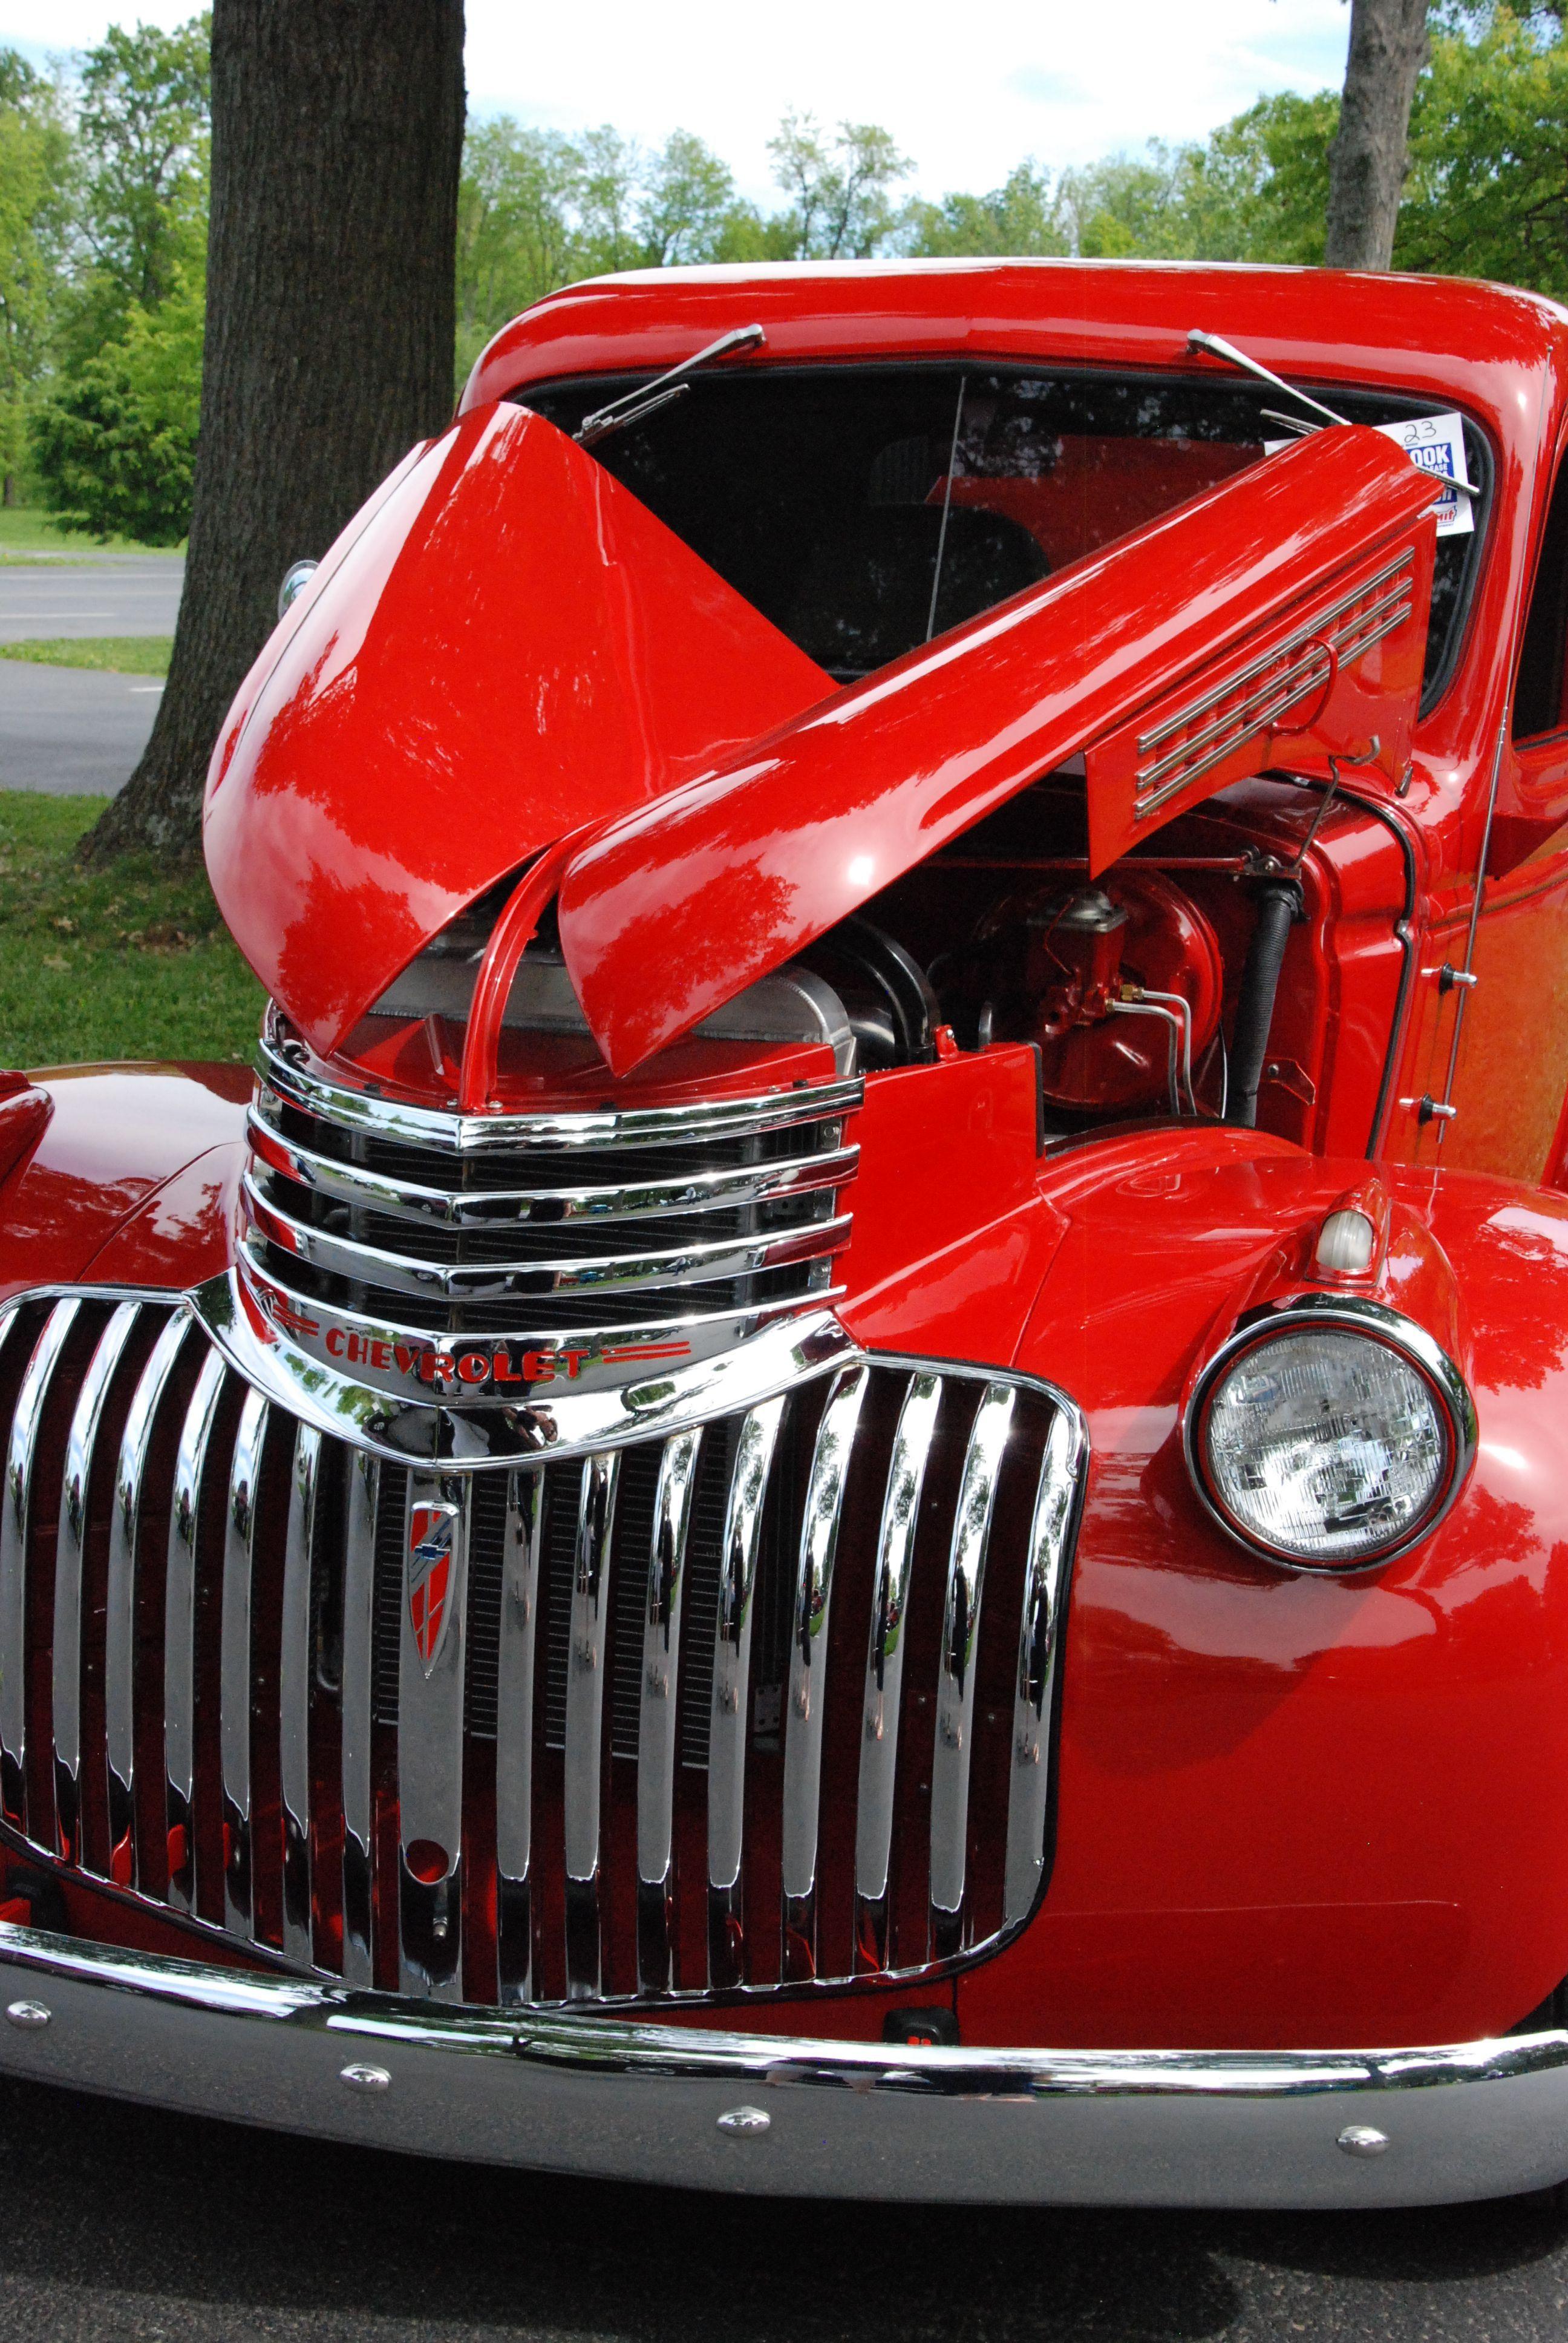 Classic red Chevy truck by Matt Jury in 2020 Classic